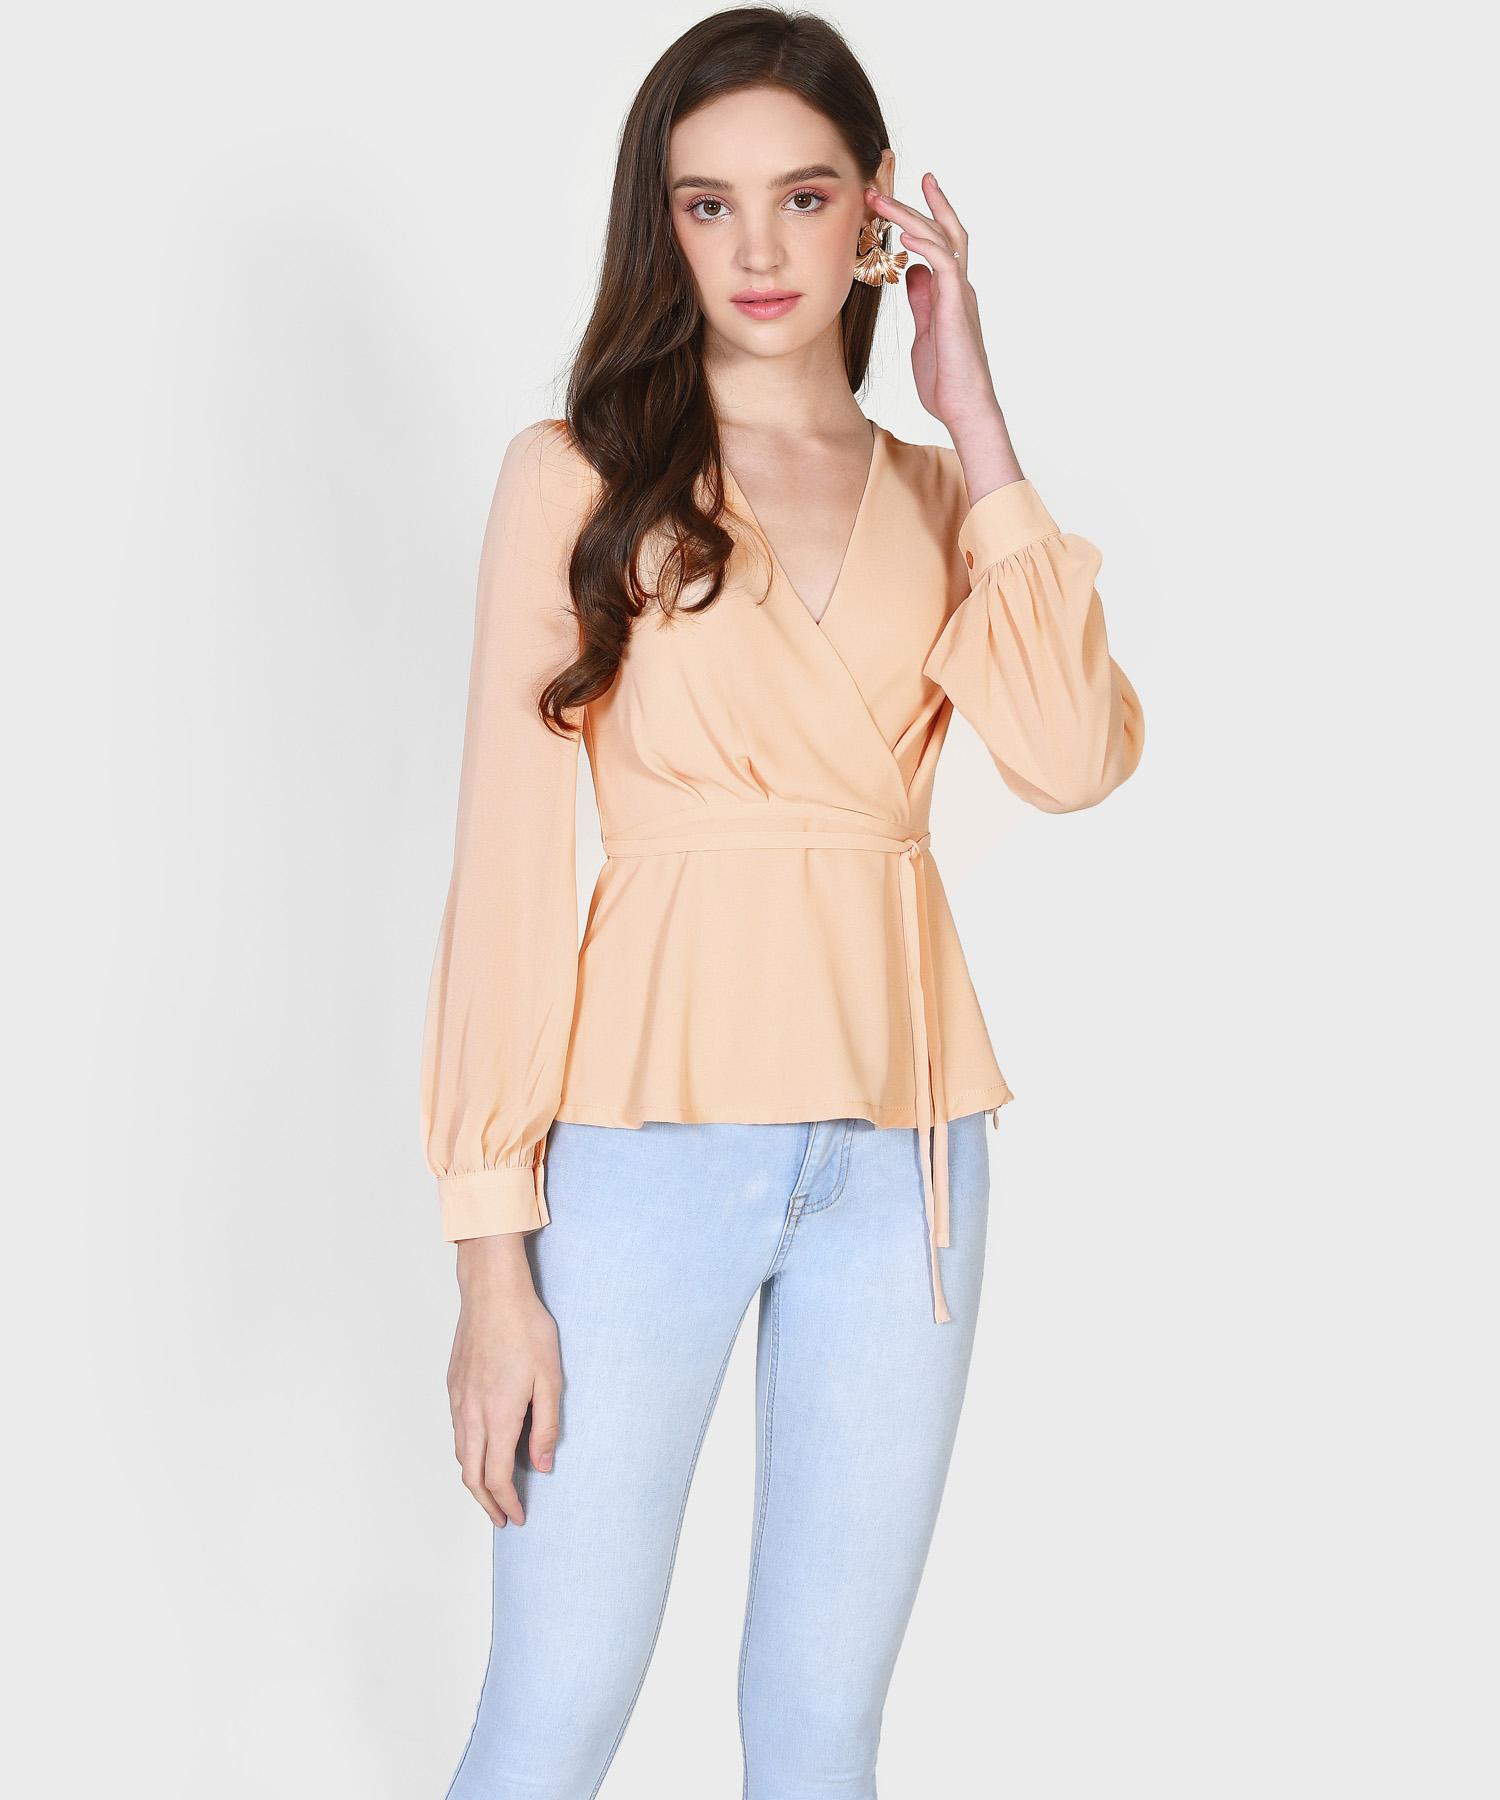 cypress-peplum-blouse-pale-peach-1